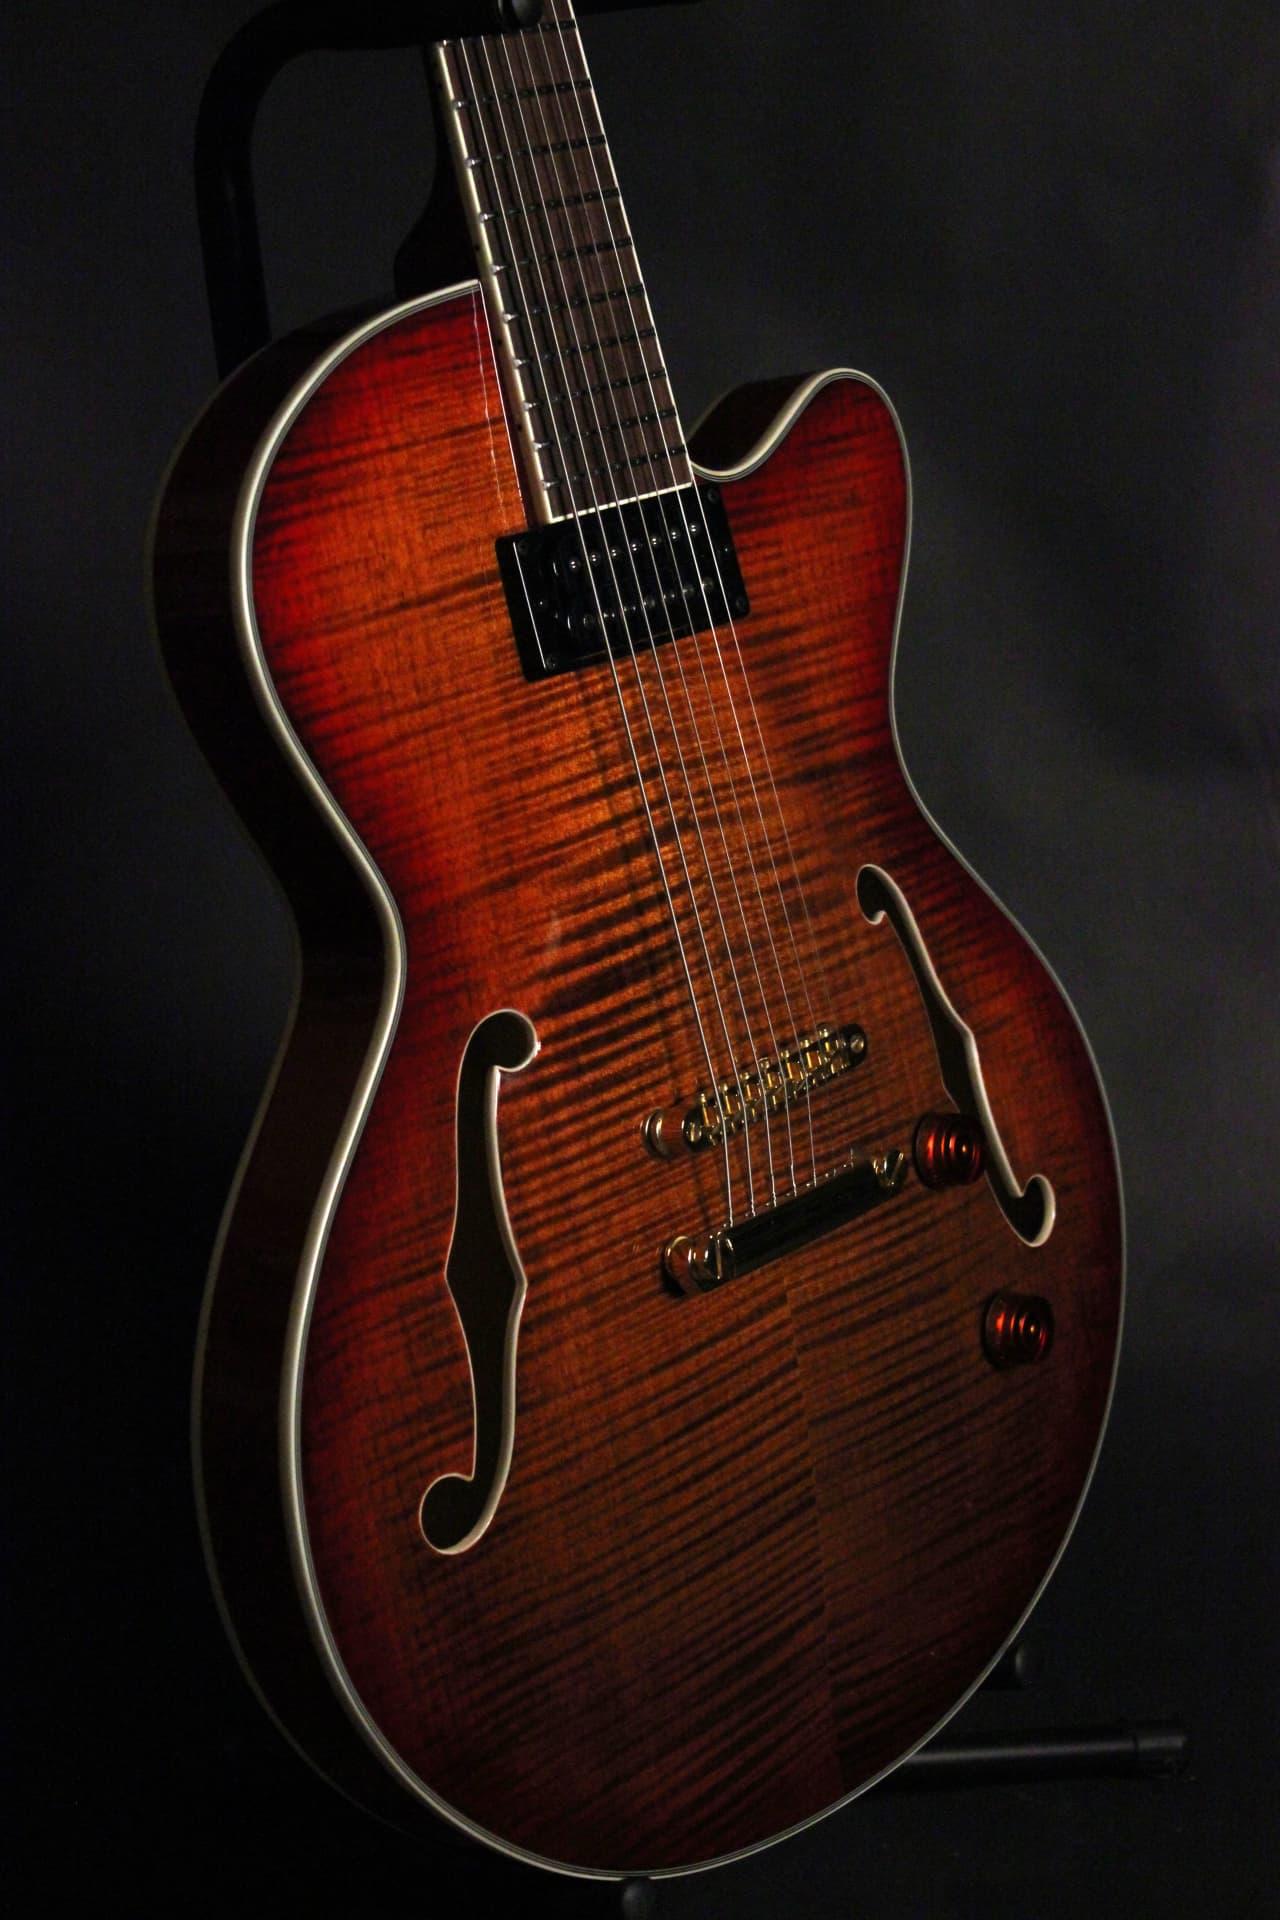 Raines LA-7 7 String Archtop Hollowbody Thinline Guitar 2017 | Reverb